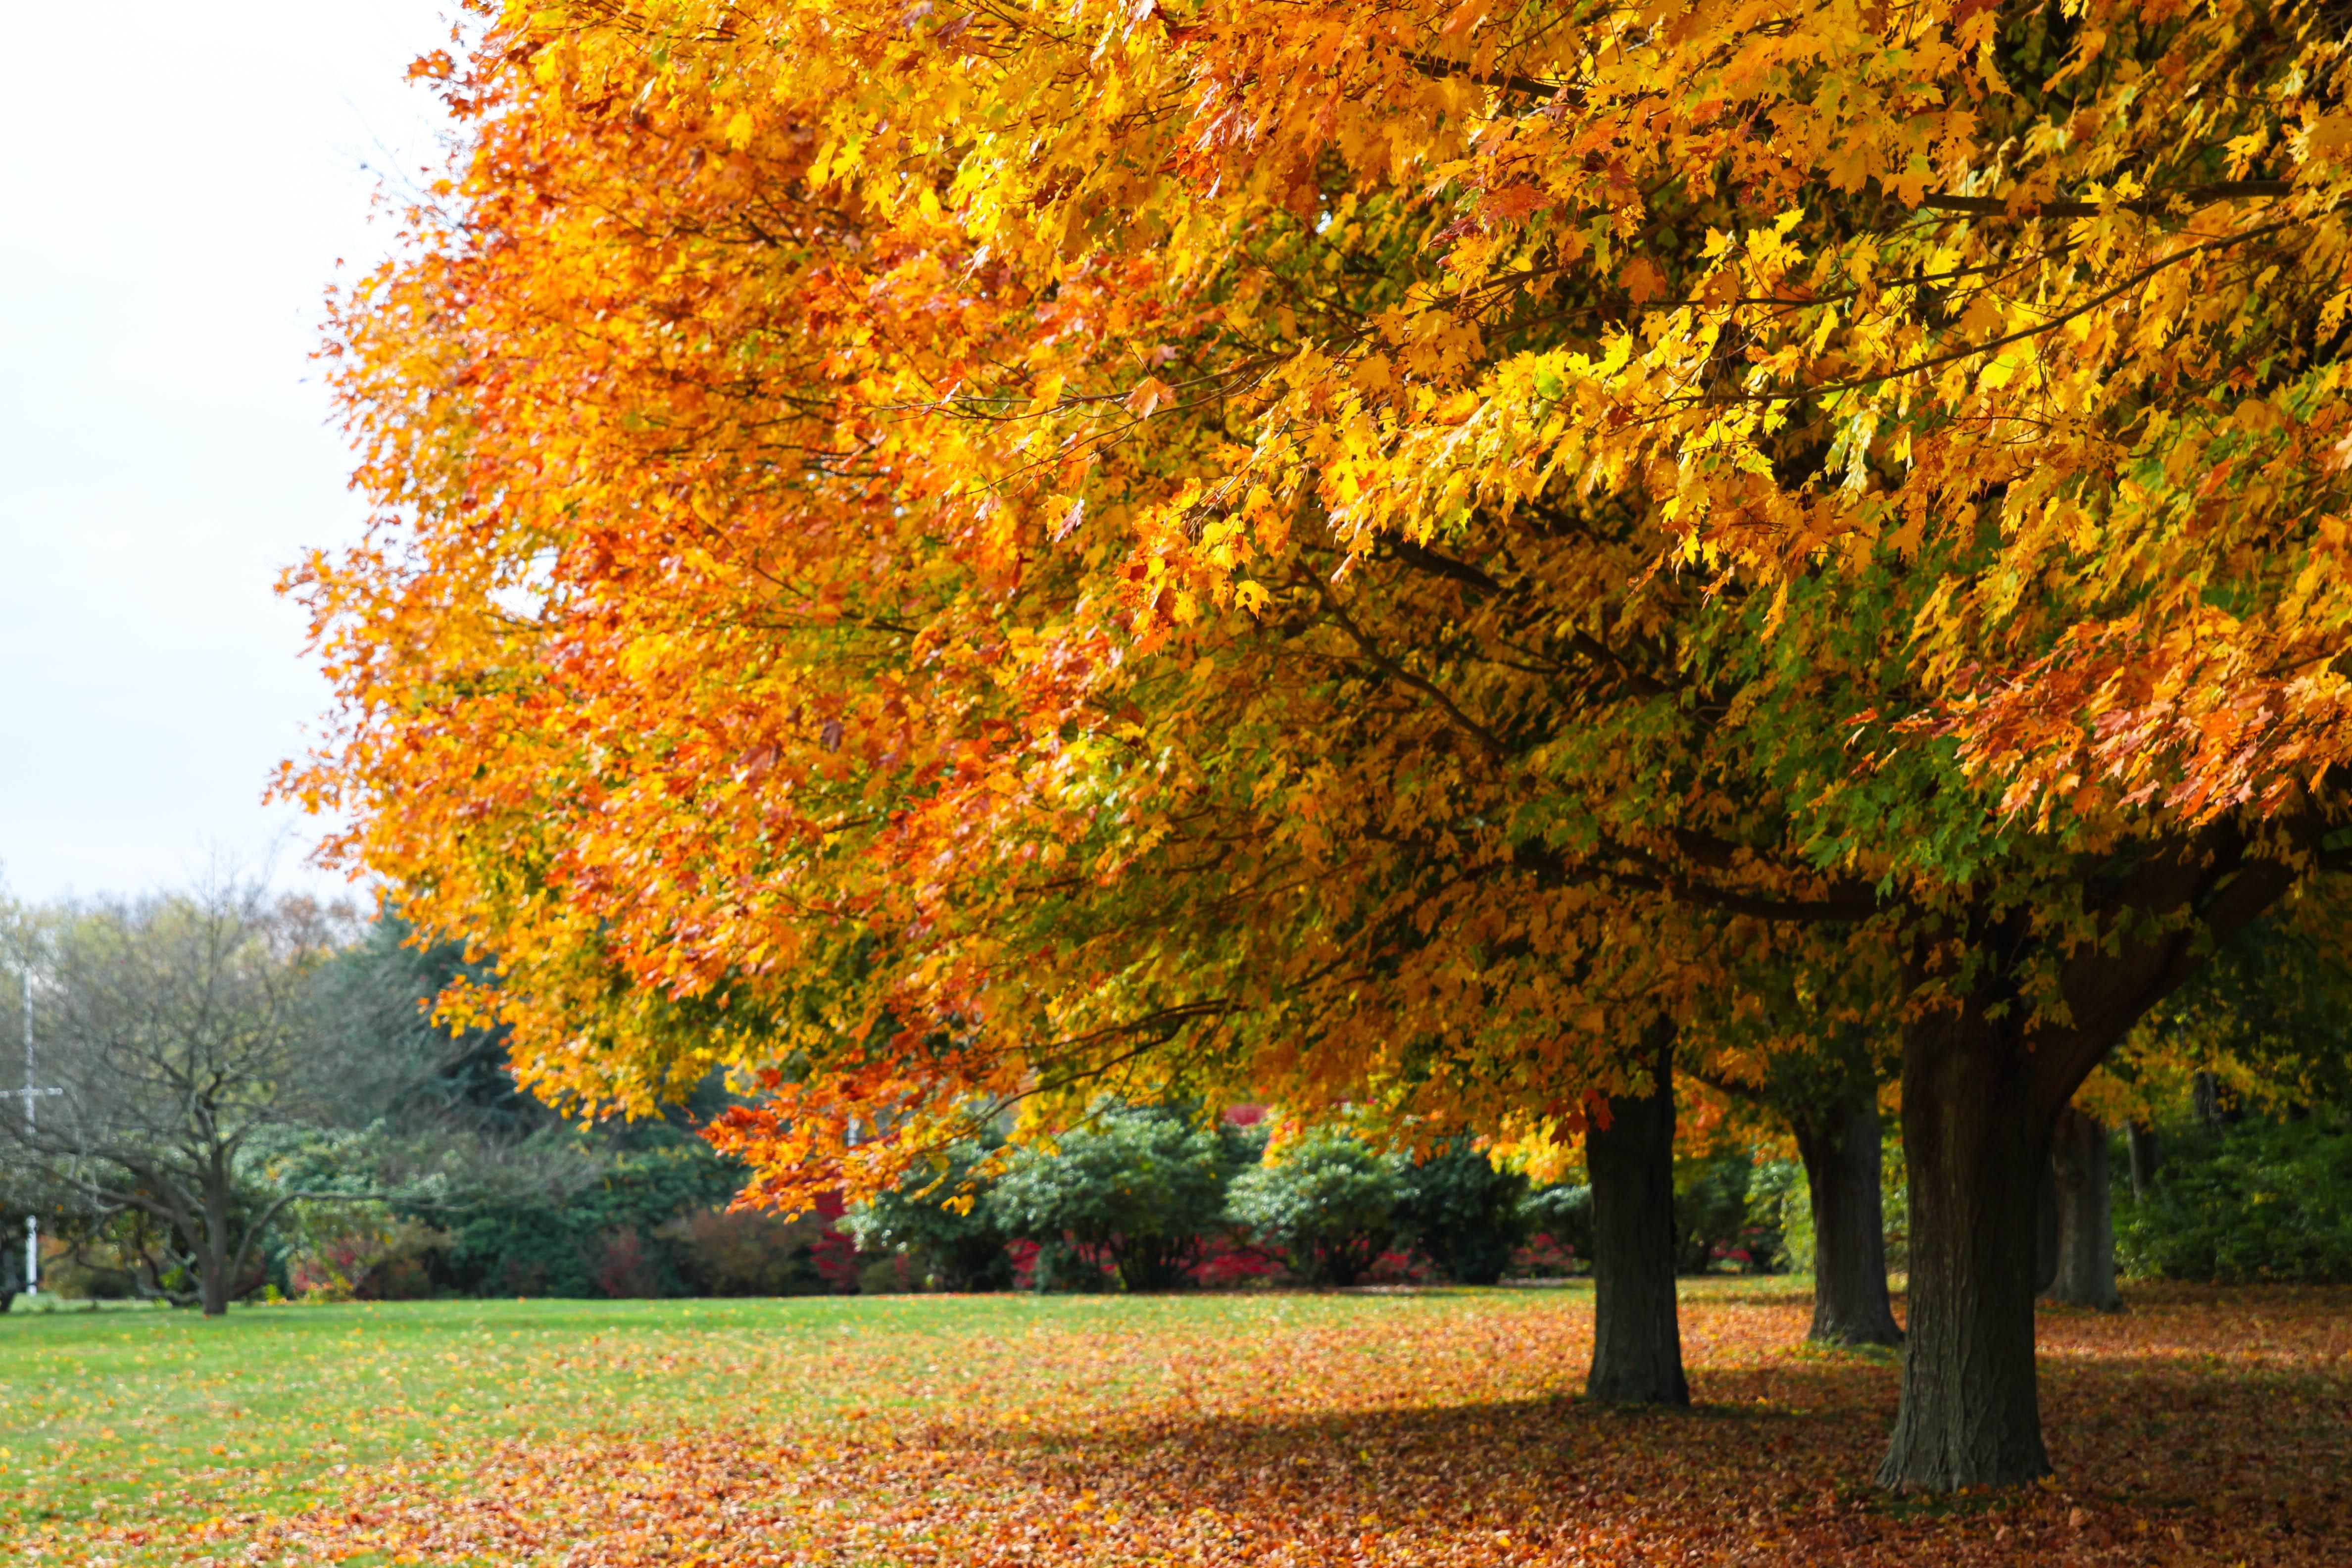 7286 fall foliage colt state park crJenniferBalch-2